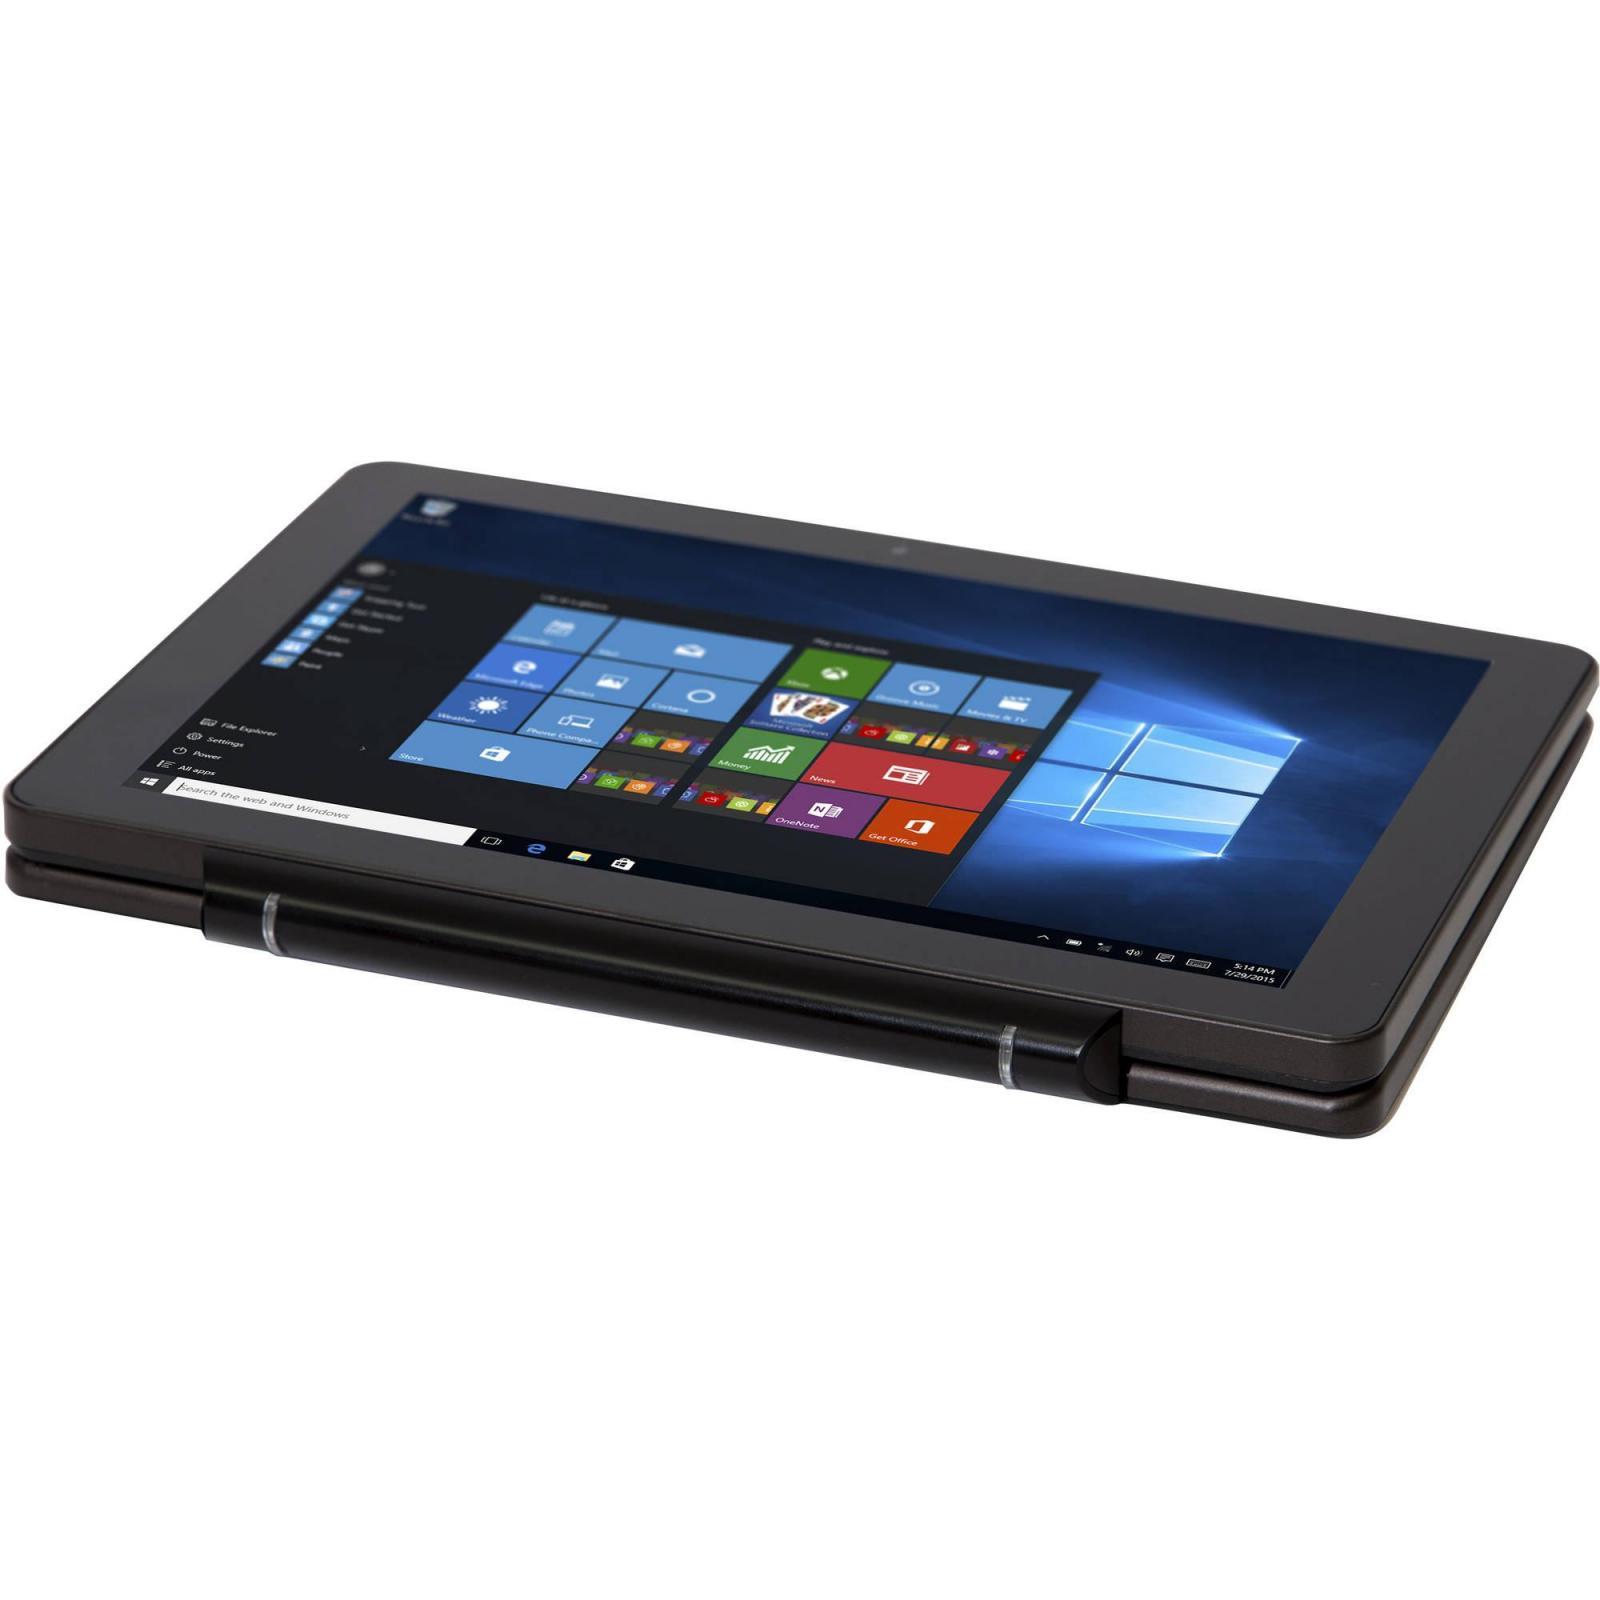 "Nextbook Flexx 8 . 9 "" 2 in 1 Tablet Laptop 32GB Intel ..."